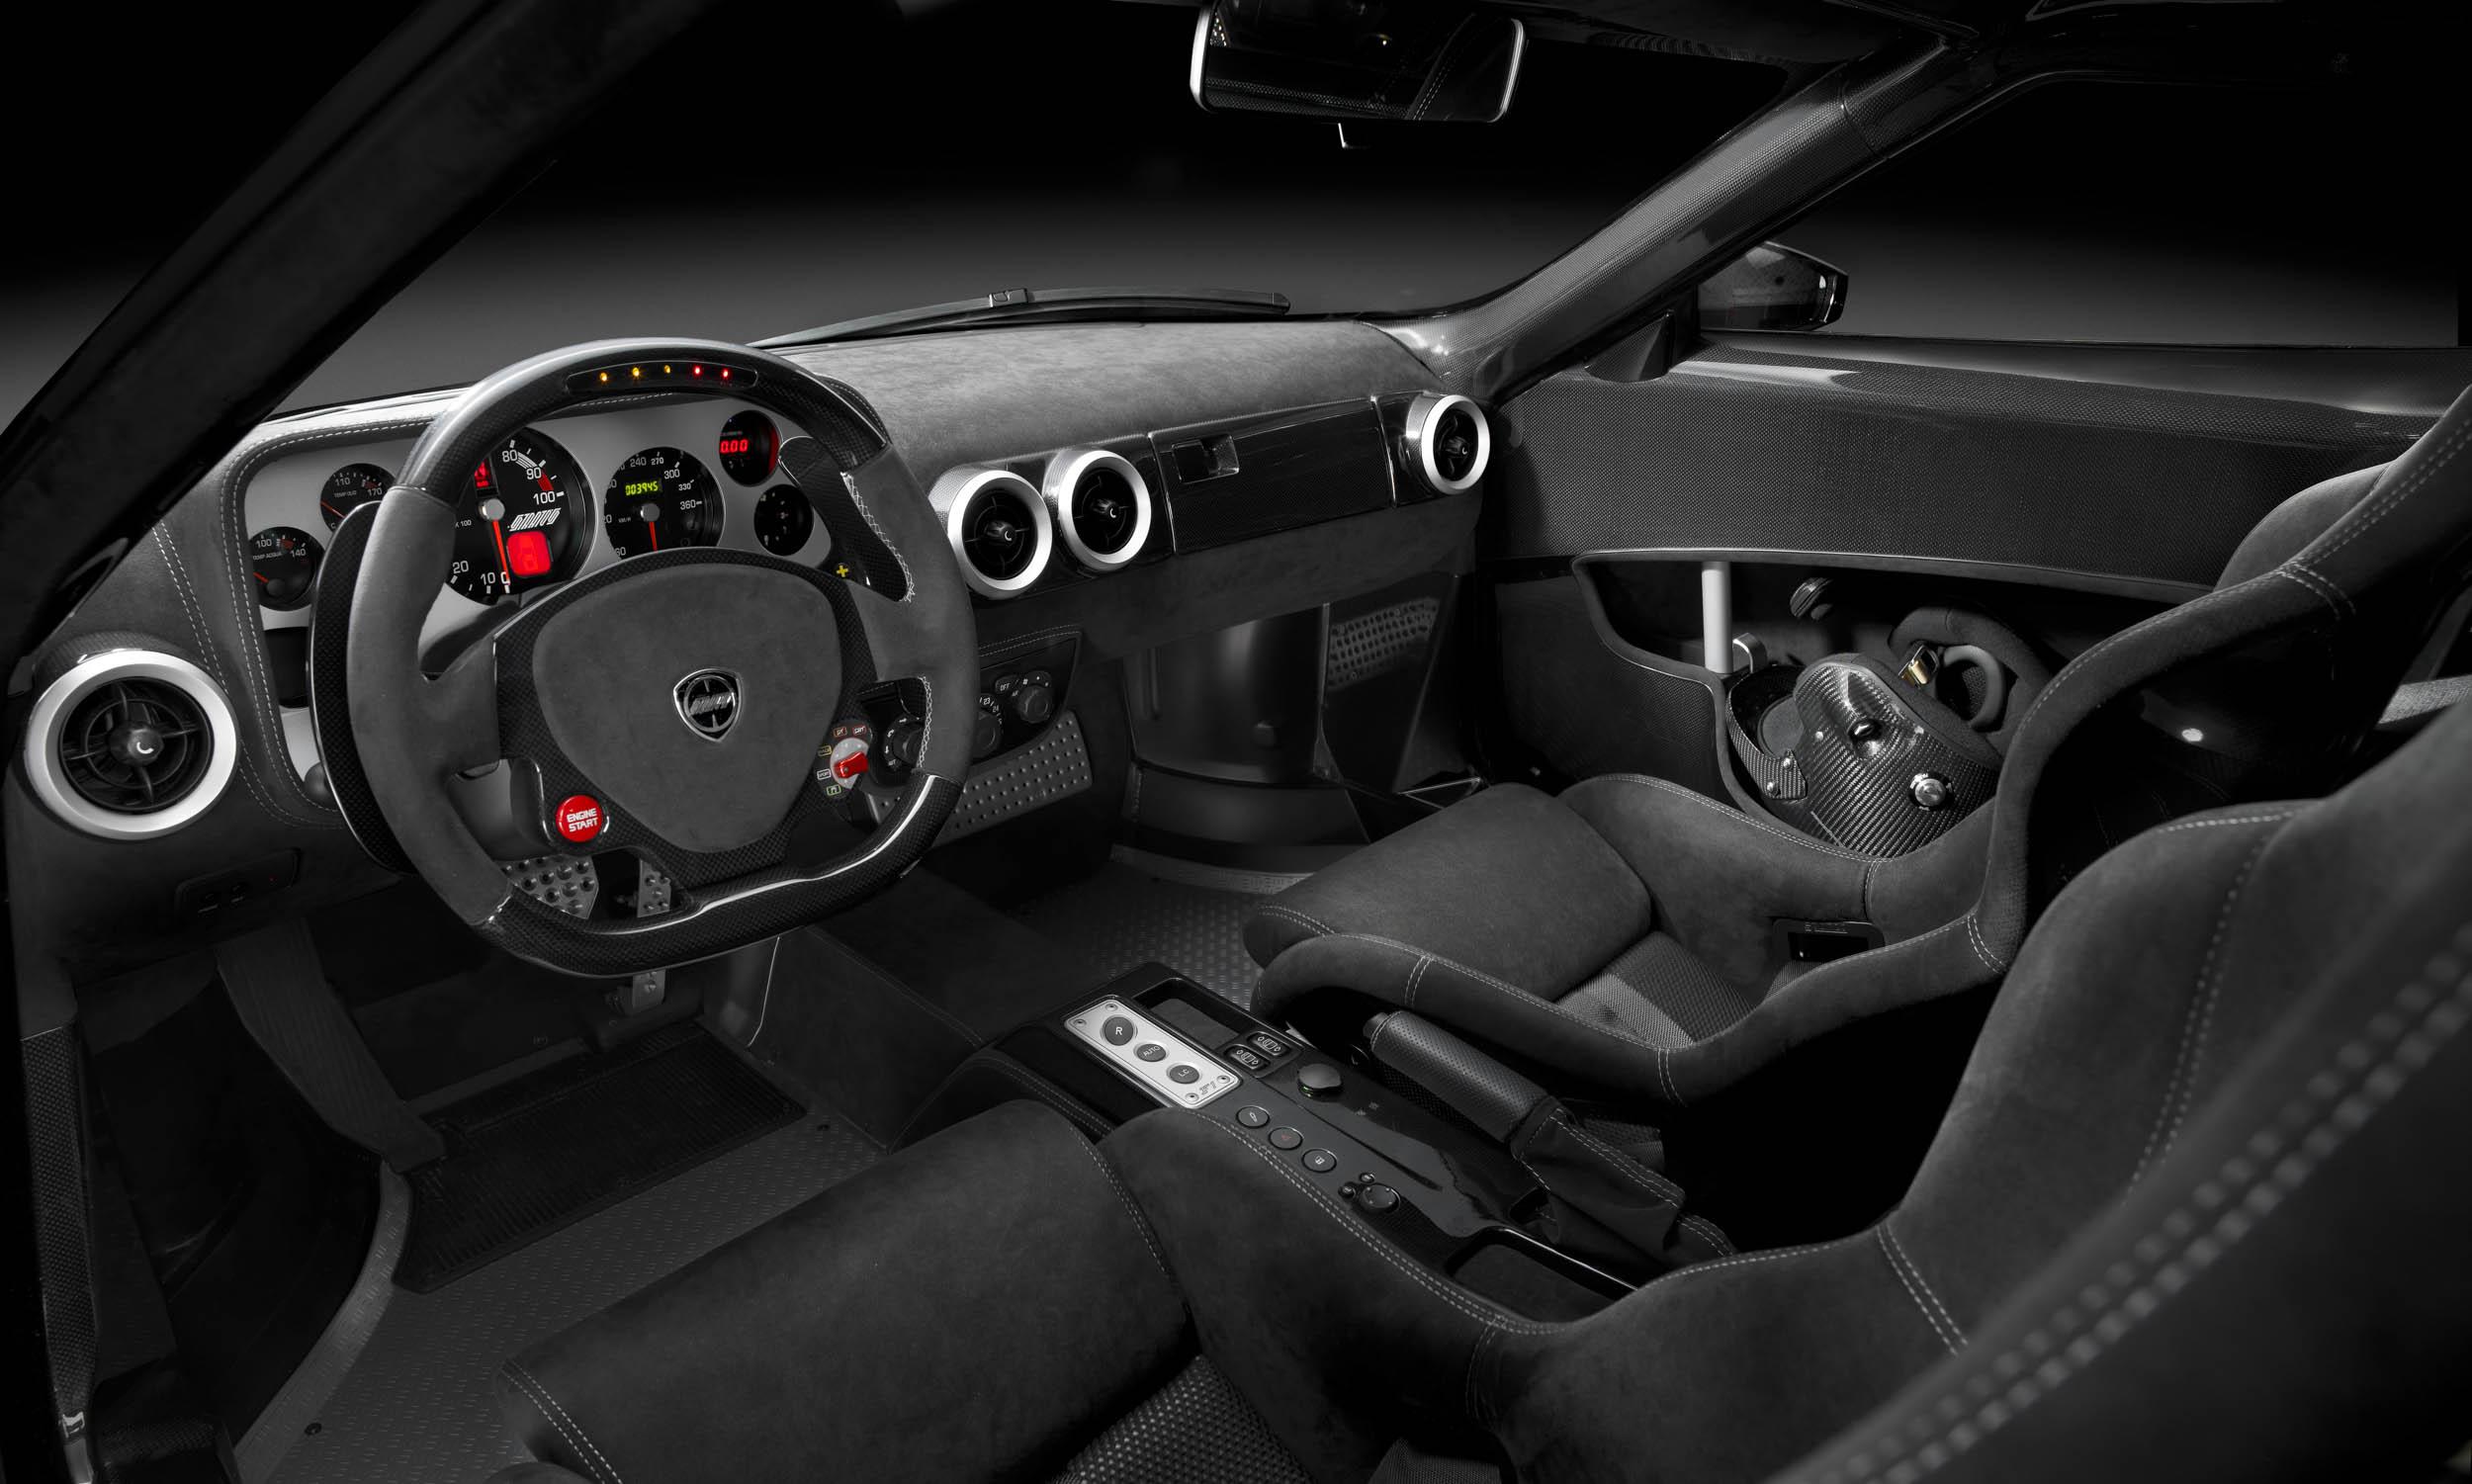 New Stratos interior